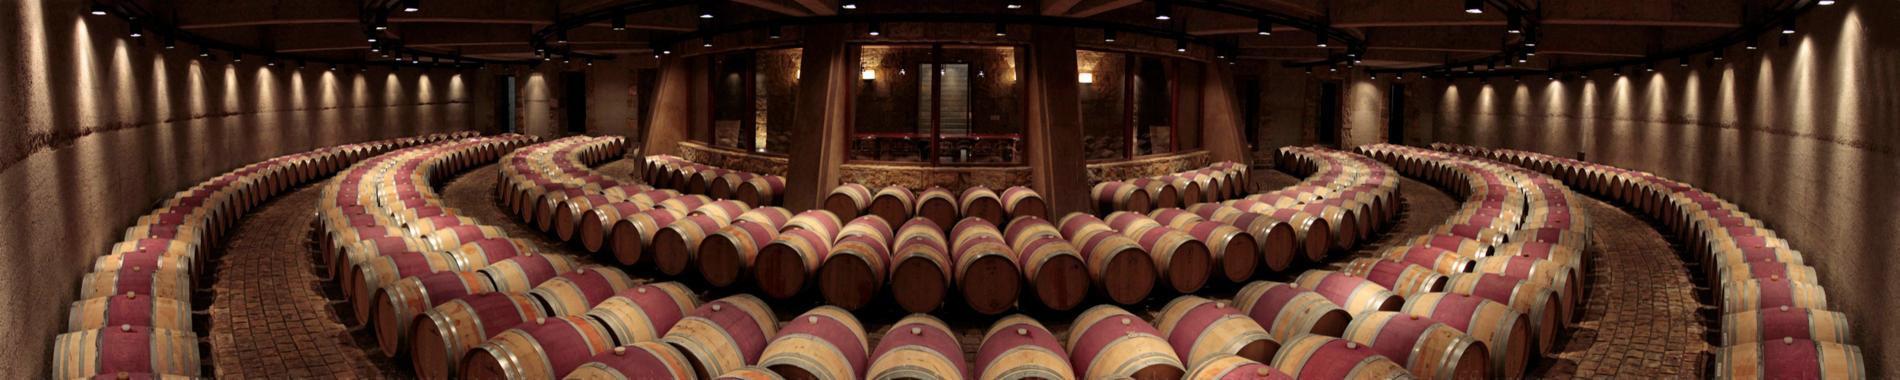 sala de barriles vino catena